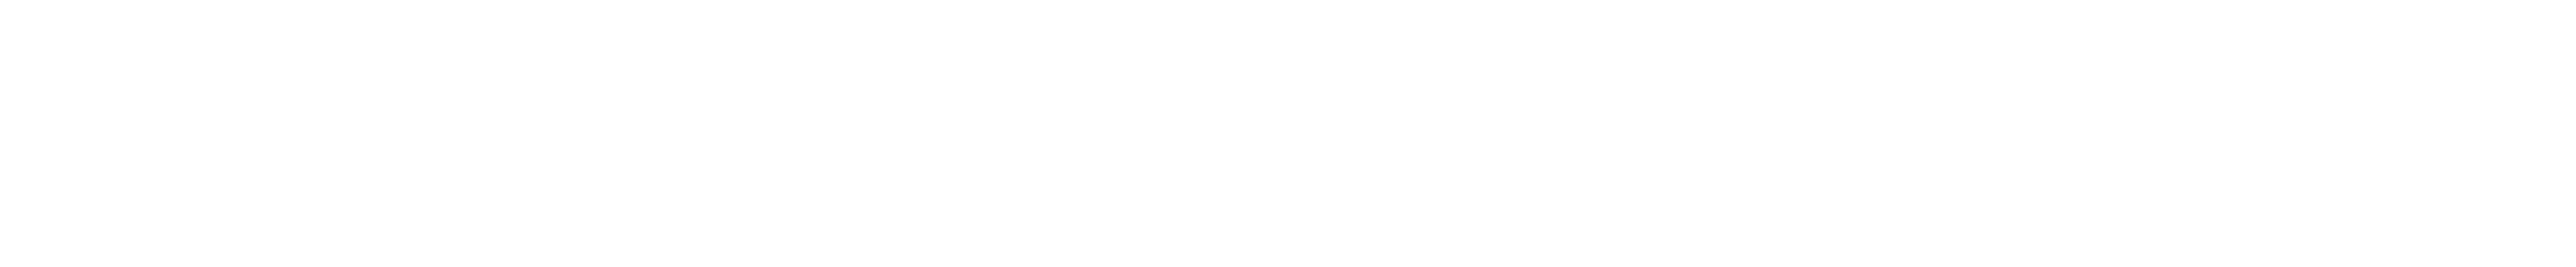 Logo Kevin Murphy